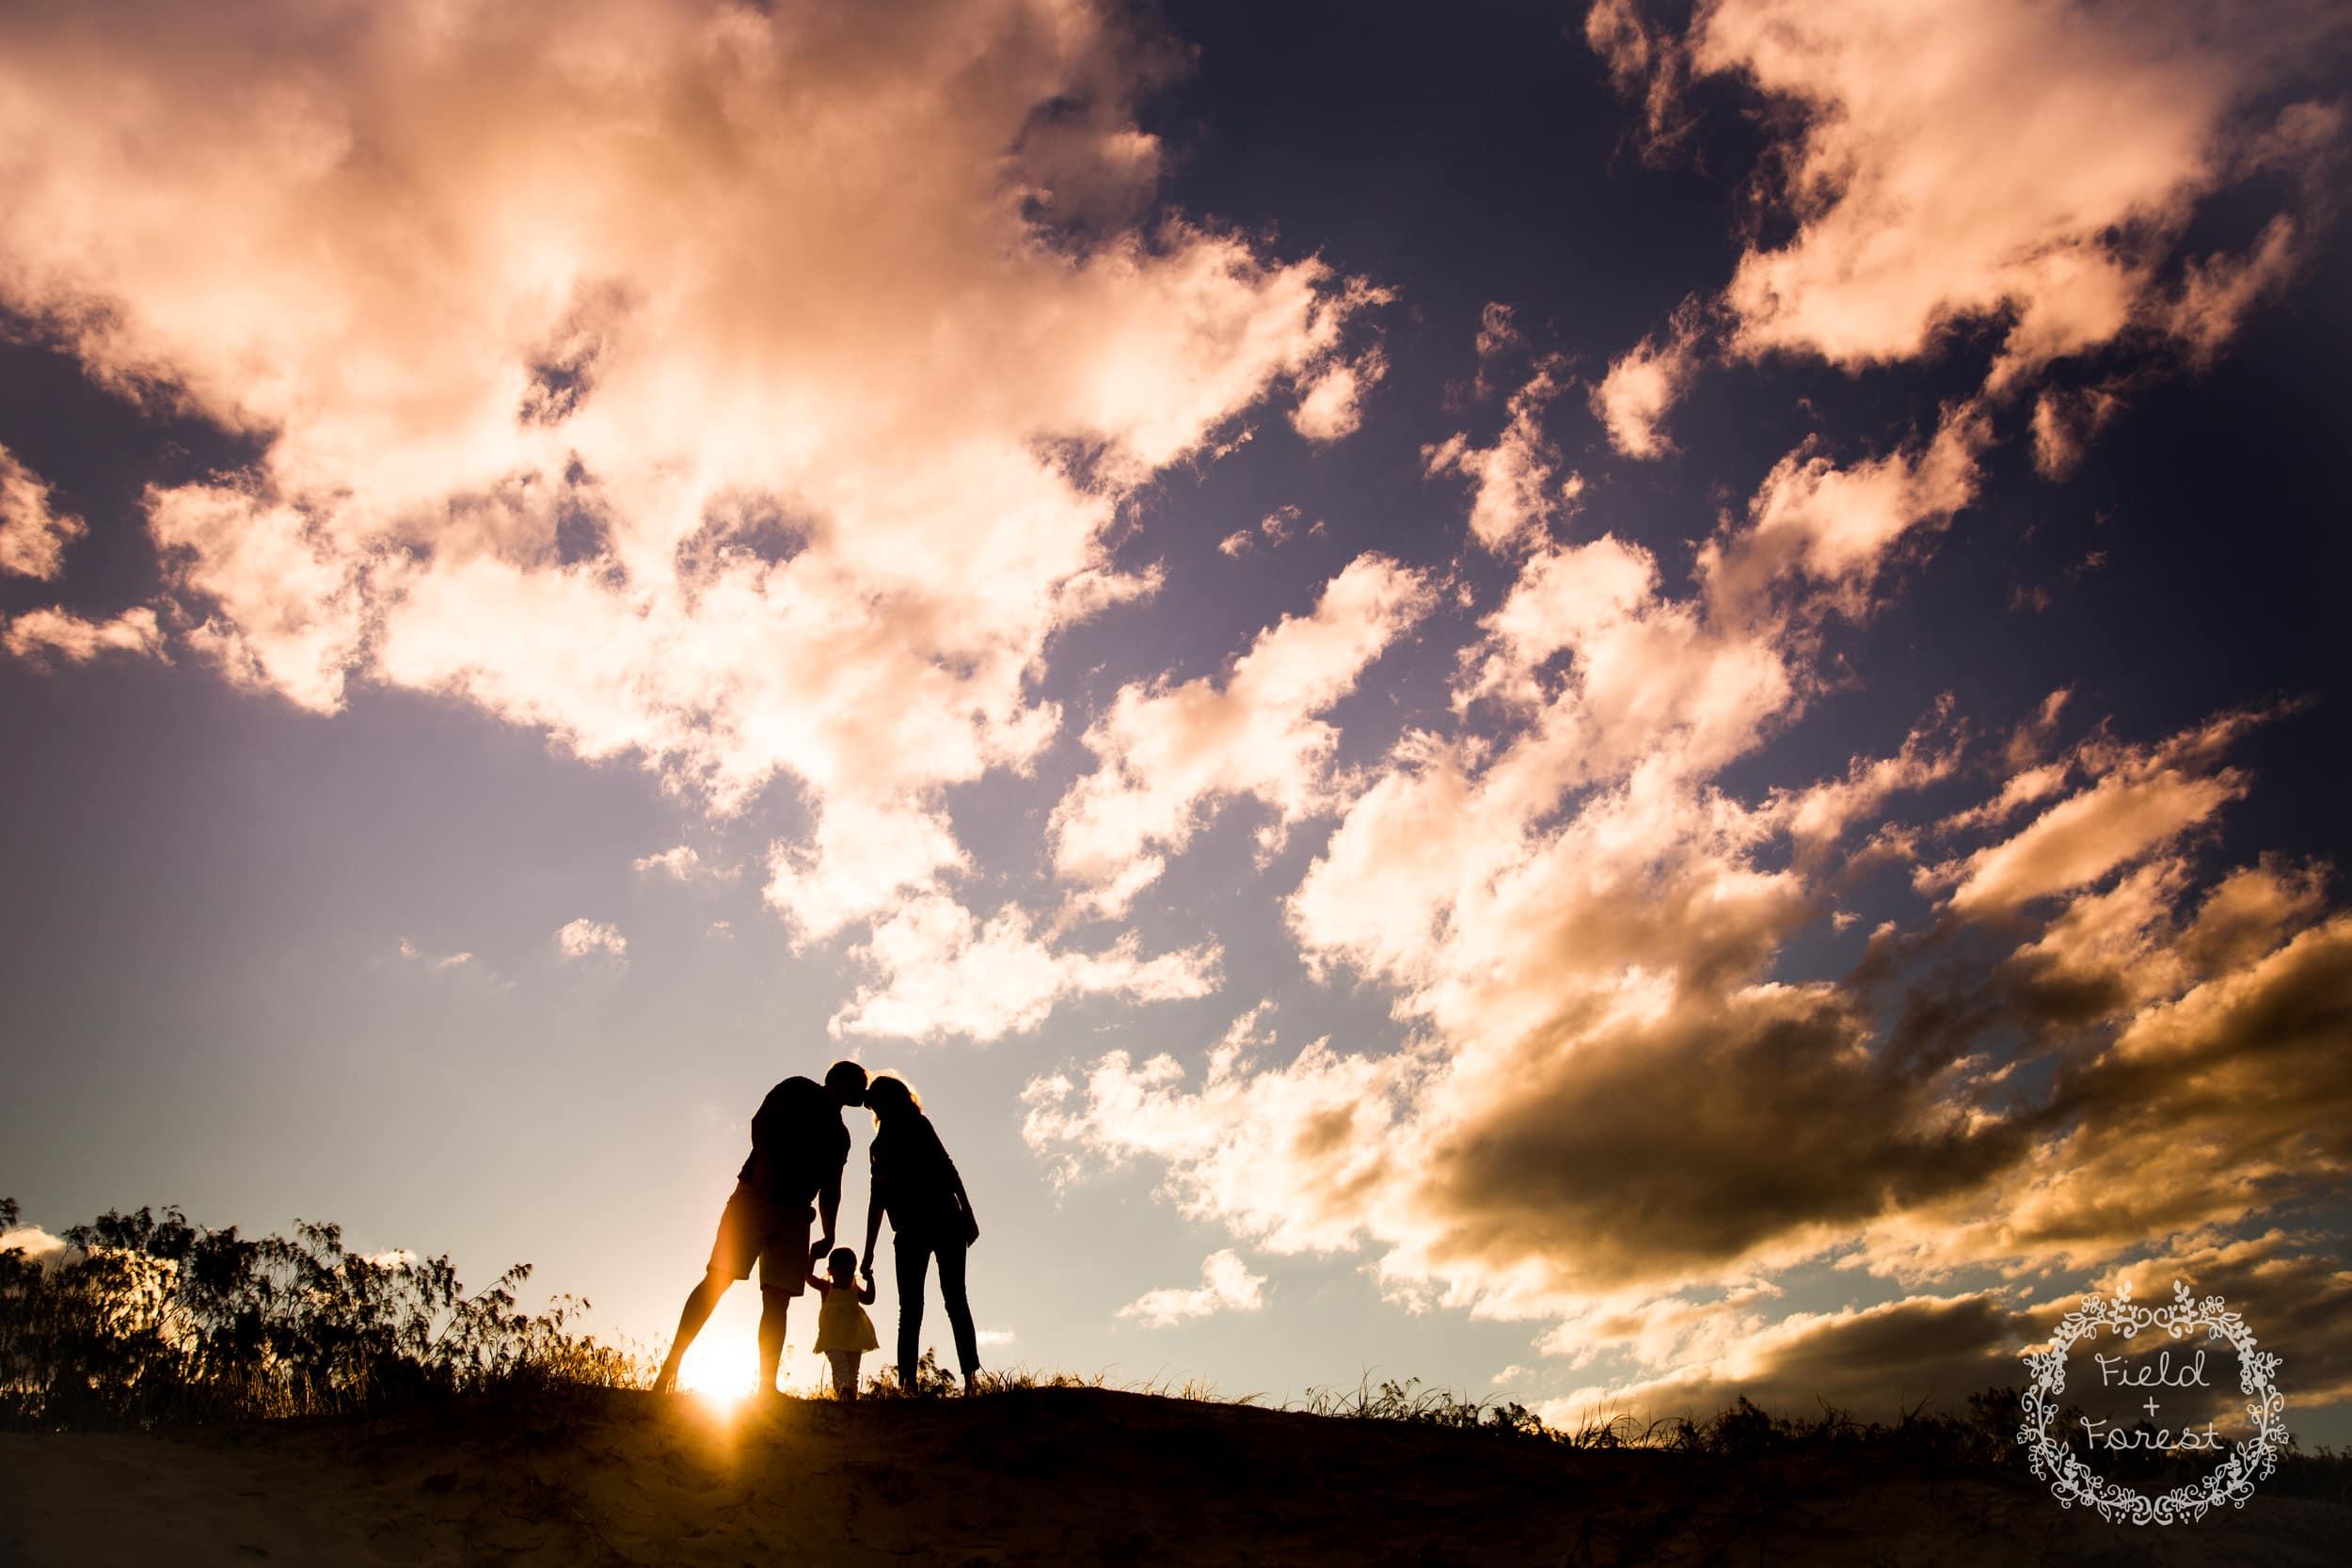 sunshine coast family portraits - field + forest photography